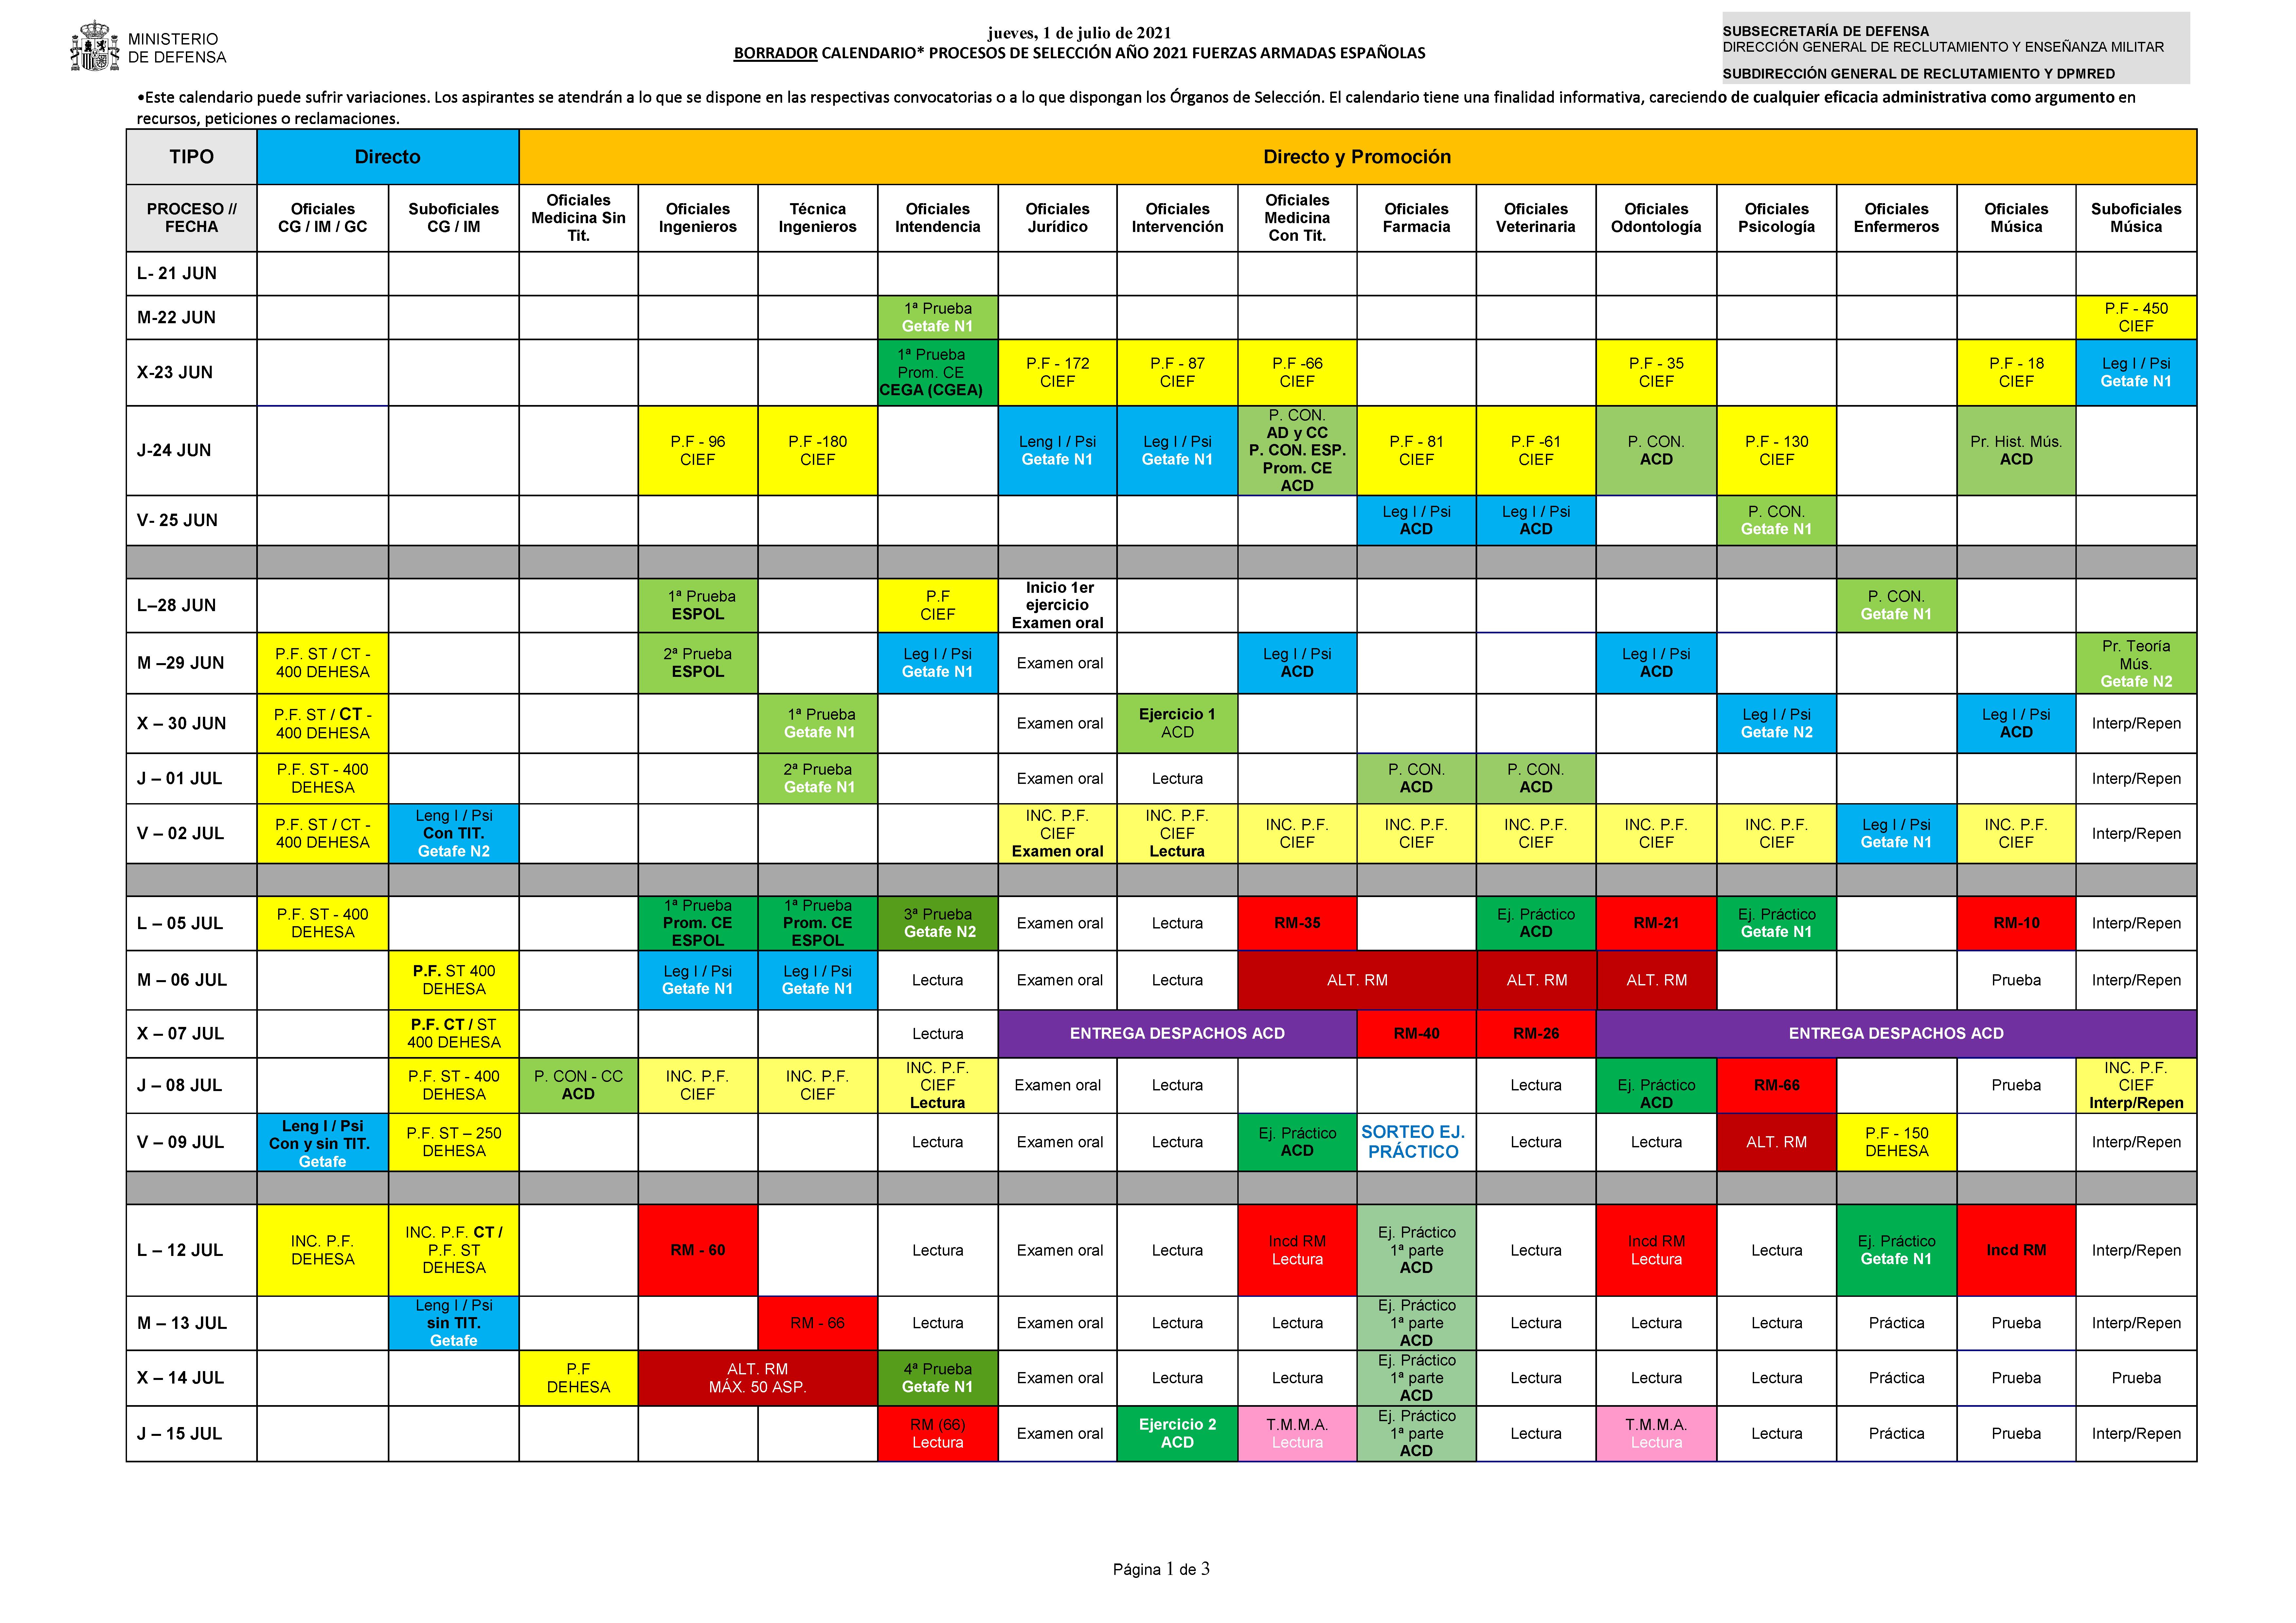 Calendario_Provisional_Procesos_de_Seleccion_2021_Página_1